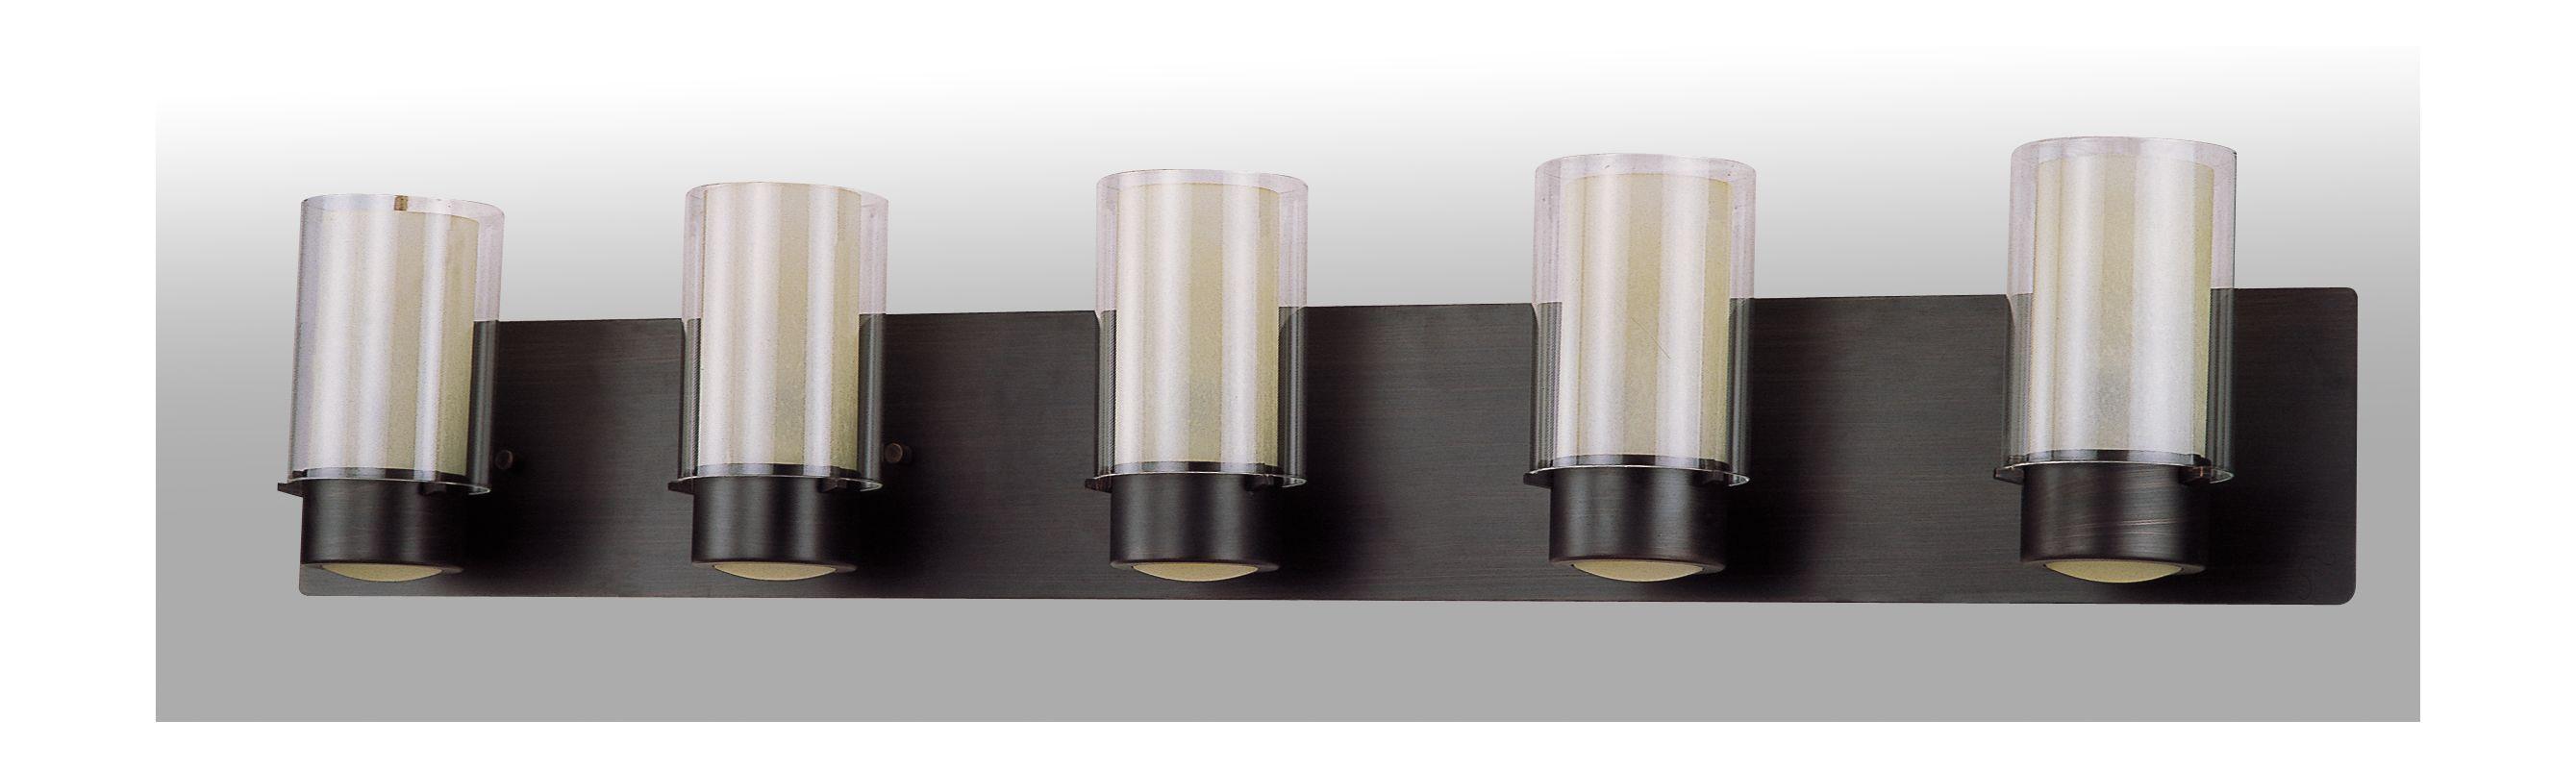 DVI Lighting DVP9055 5 Light Vanity from the Essex Collection Oil